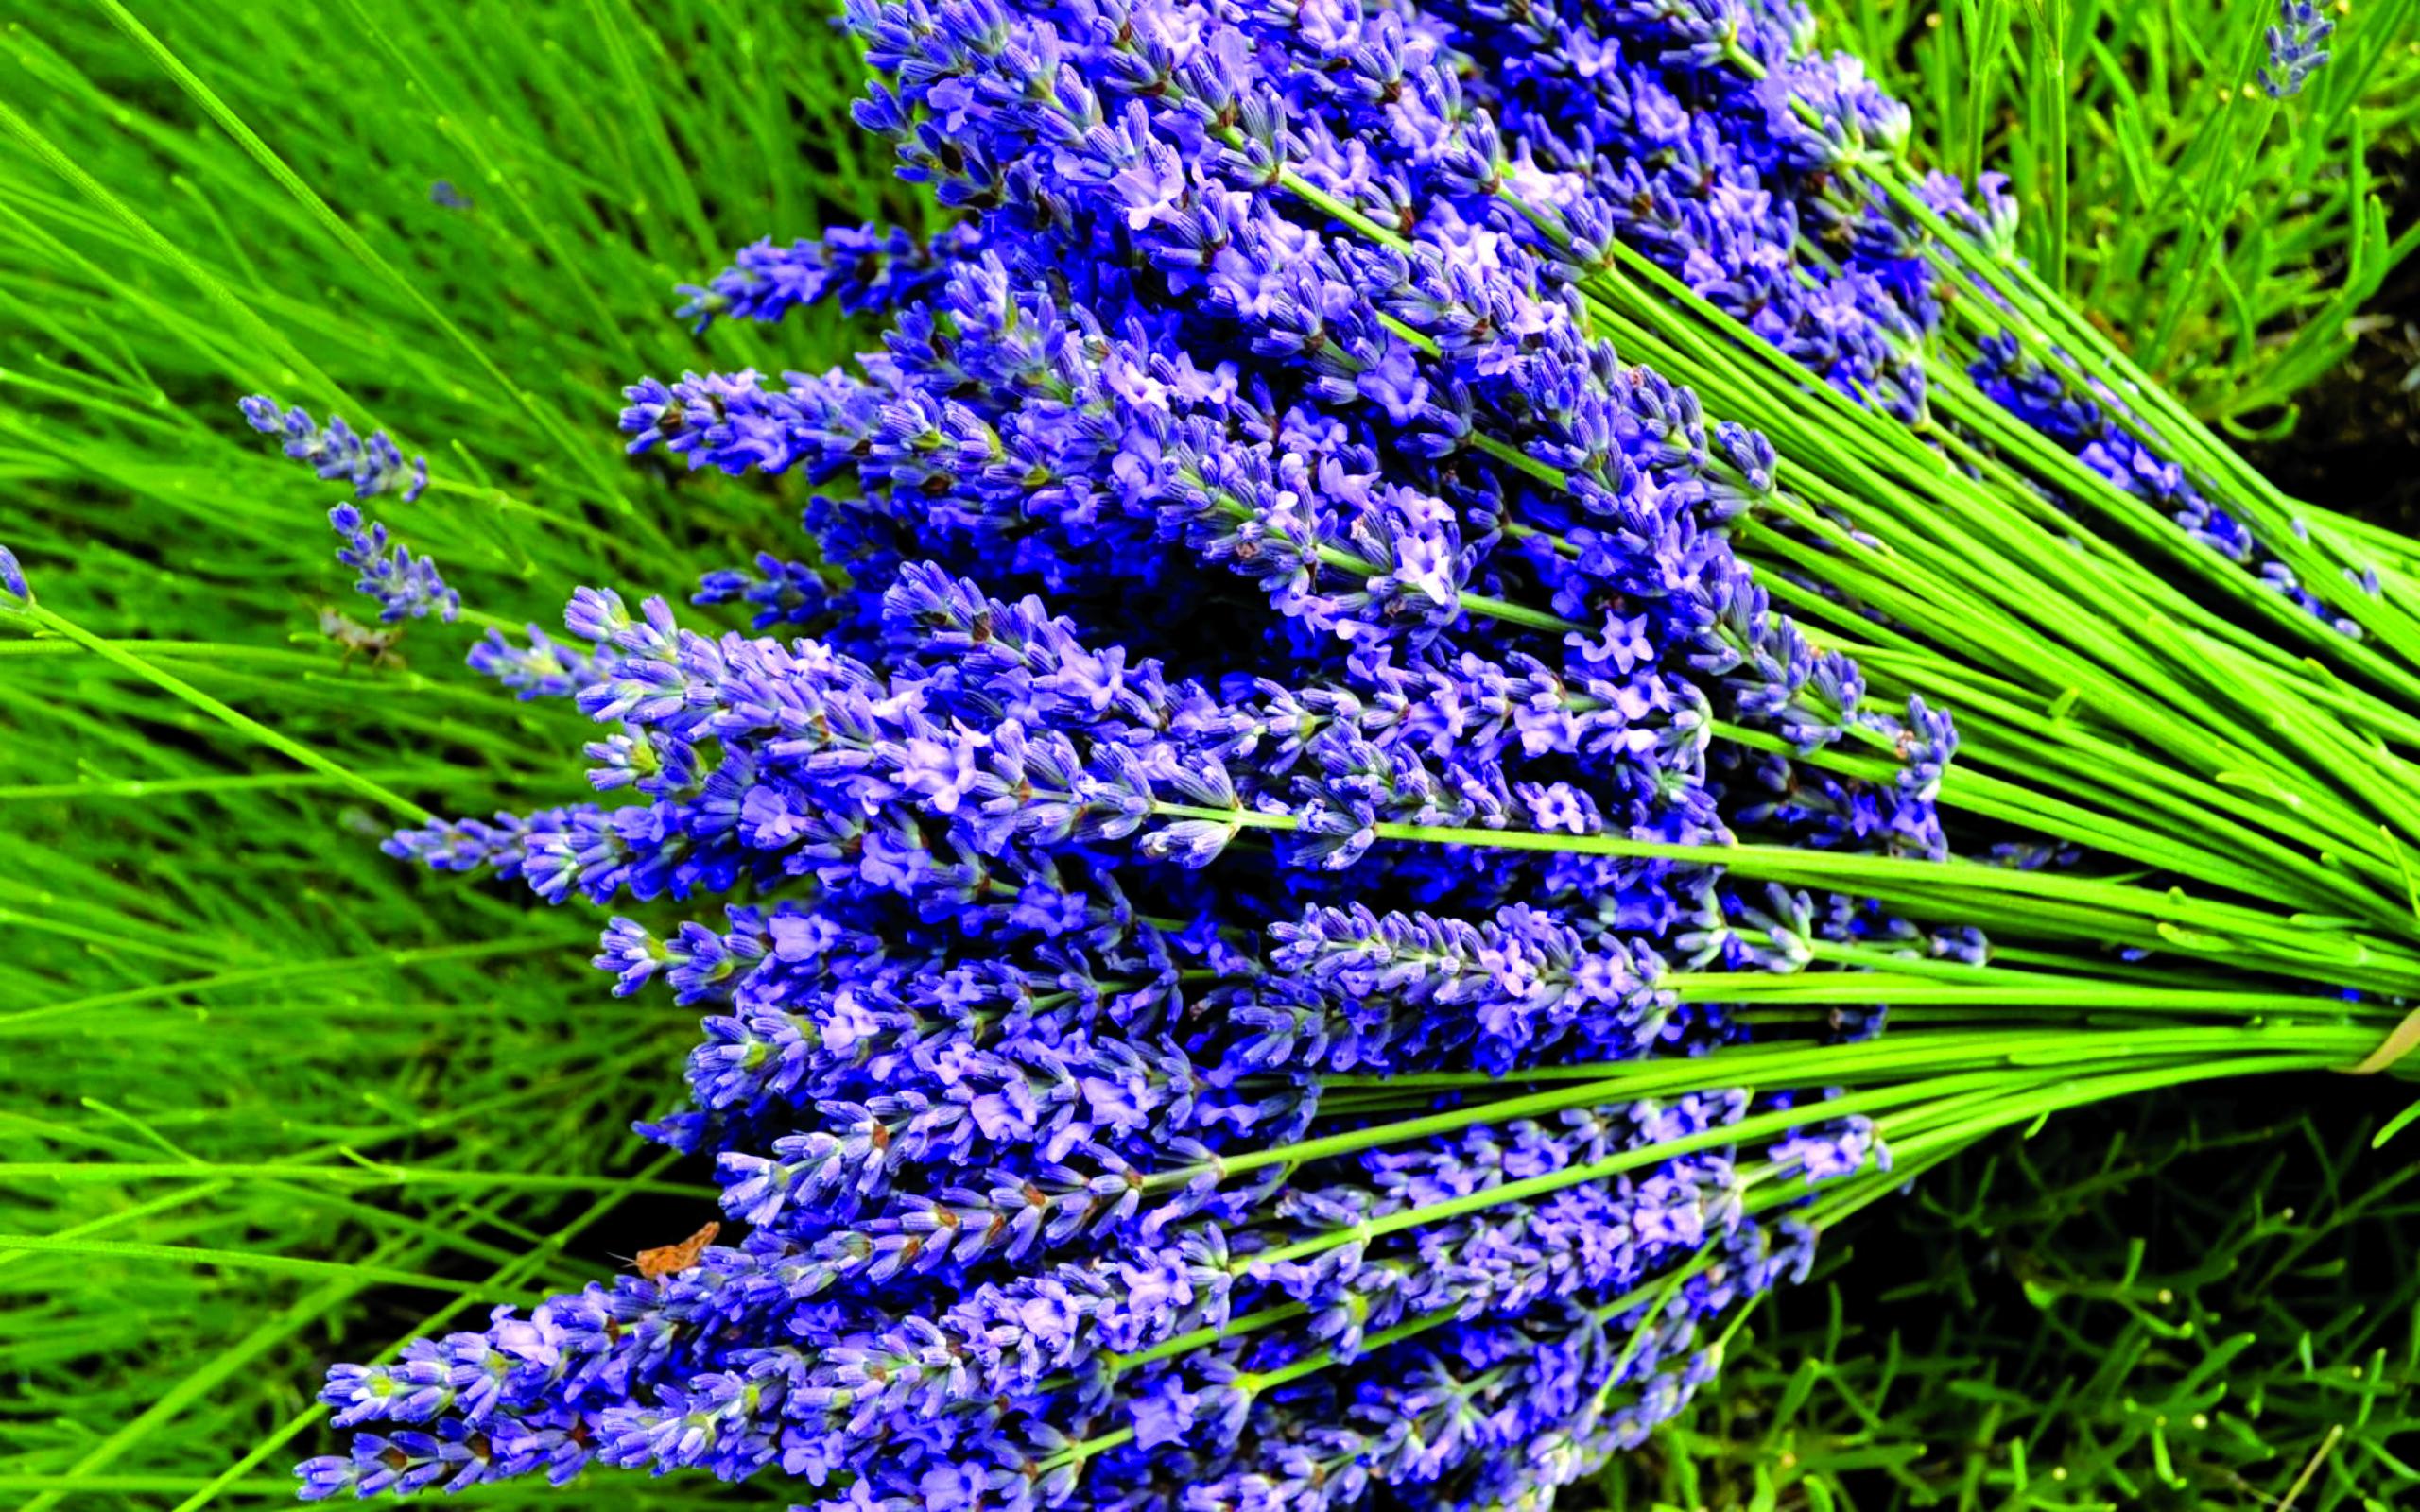 lavender_flowers_bouquets_greens_close-up_42929_3840x2400